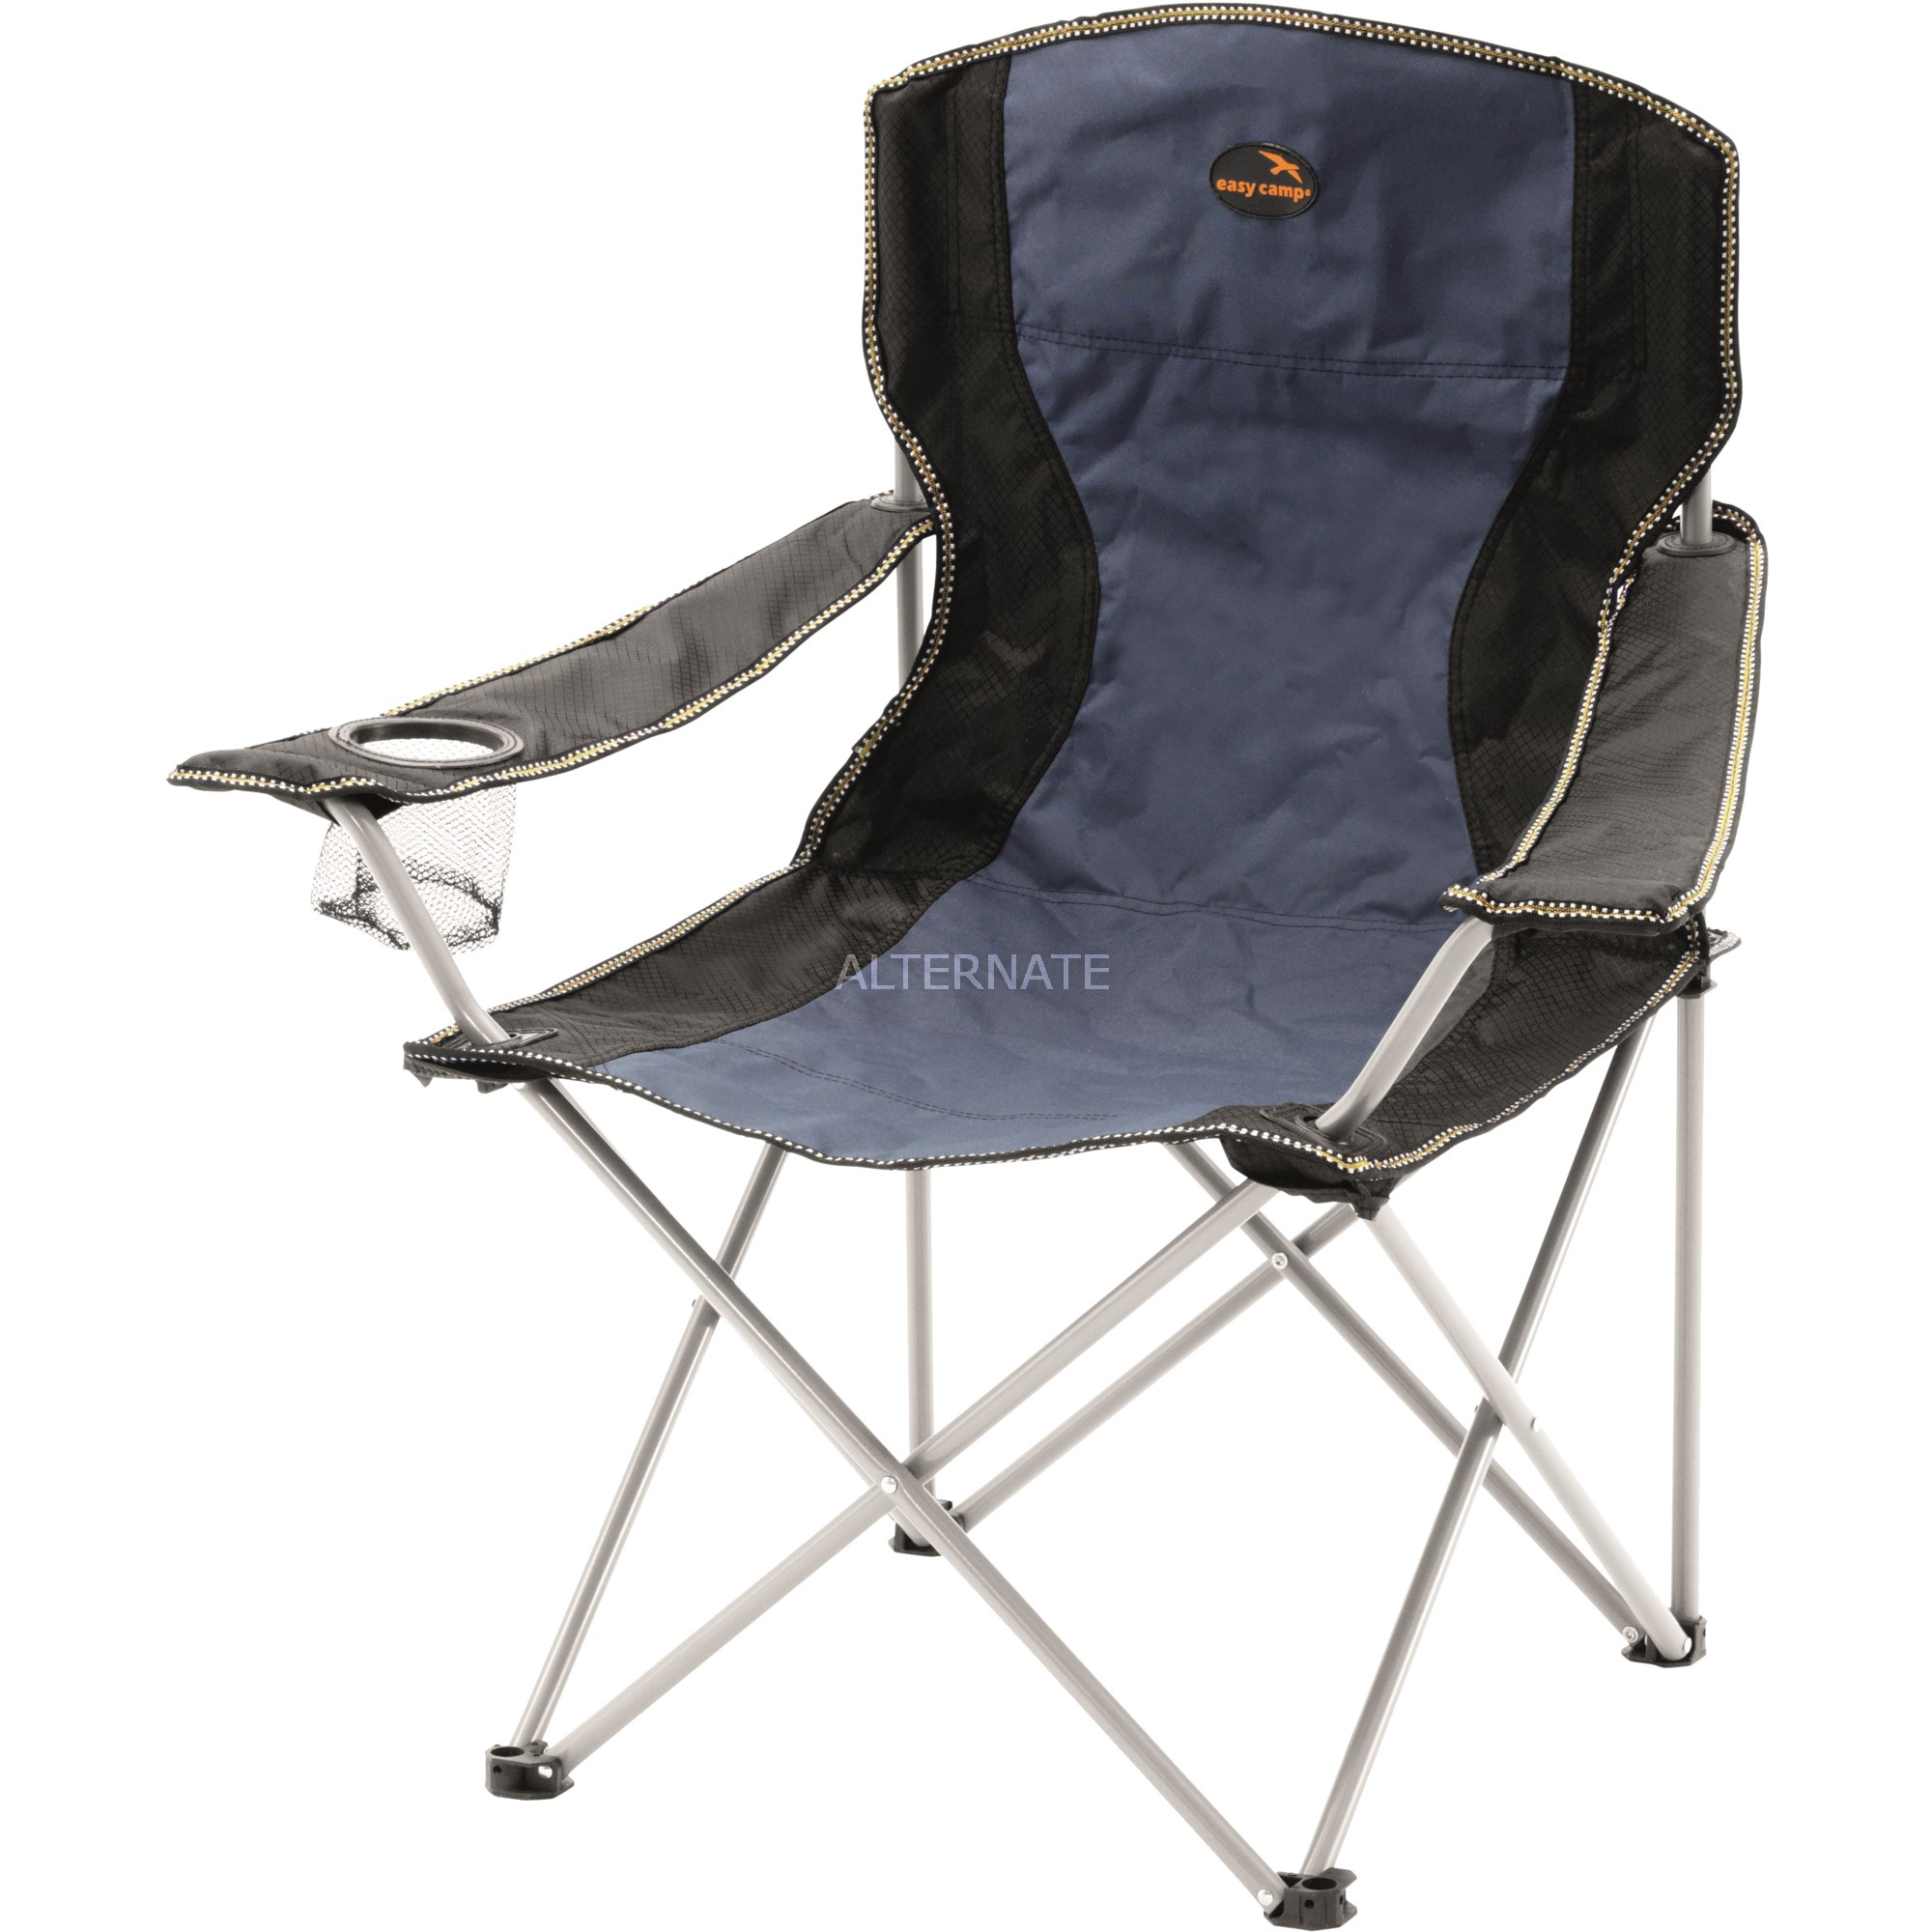 480022 Camping chair 4leg(s) Blå campingstol